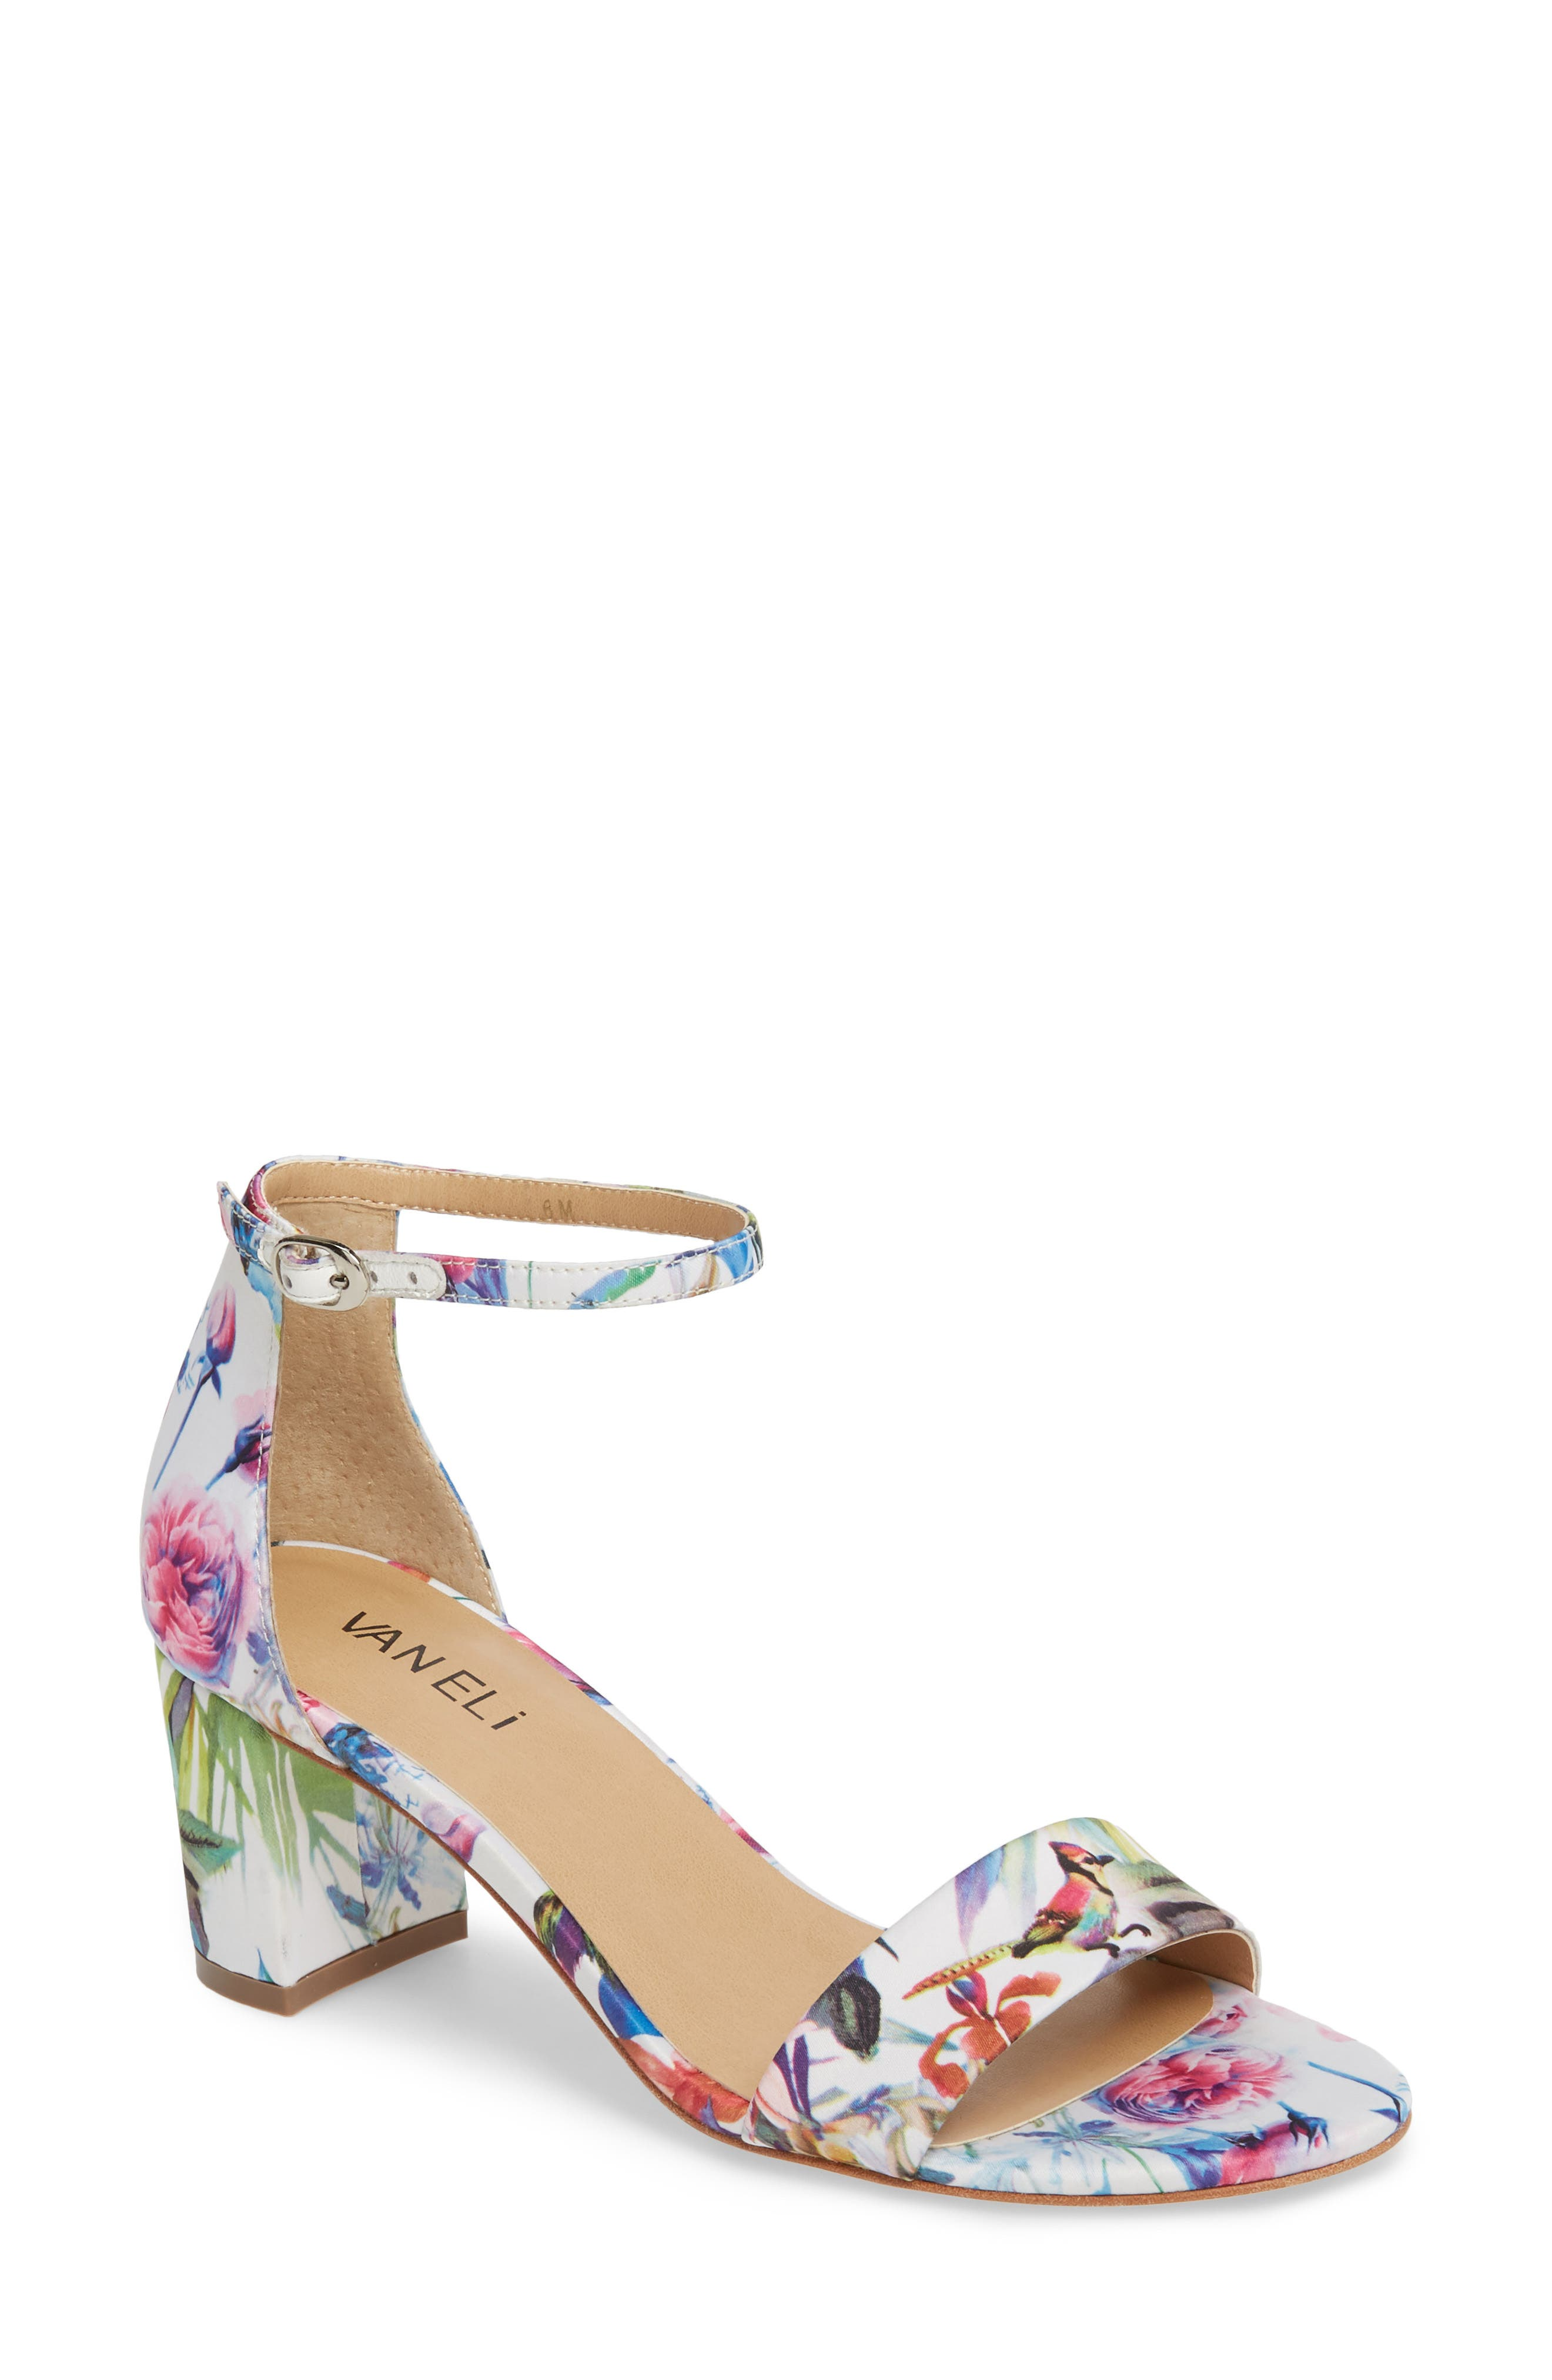 Meres Ankle Strap Sandal,                             Main thumbnail 1, color,                             400